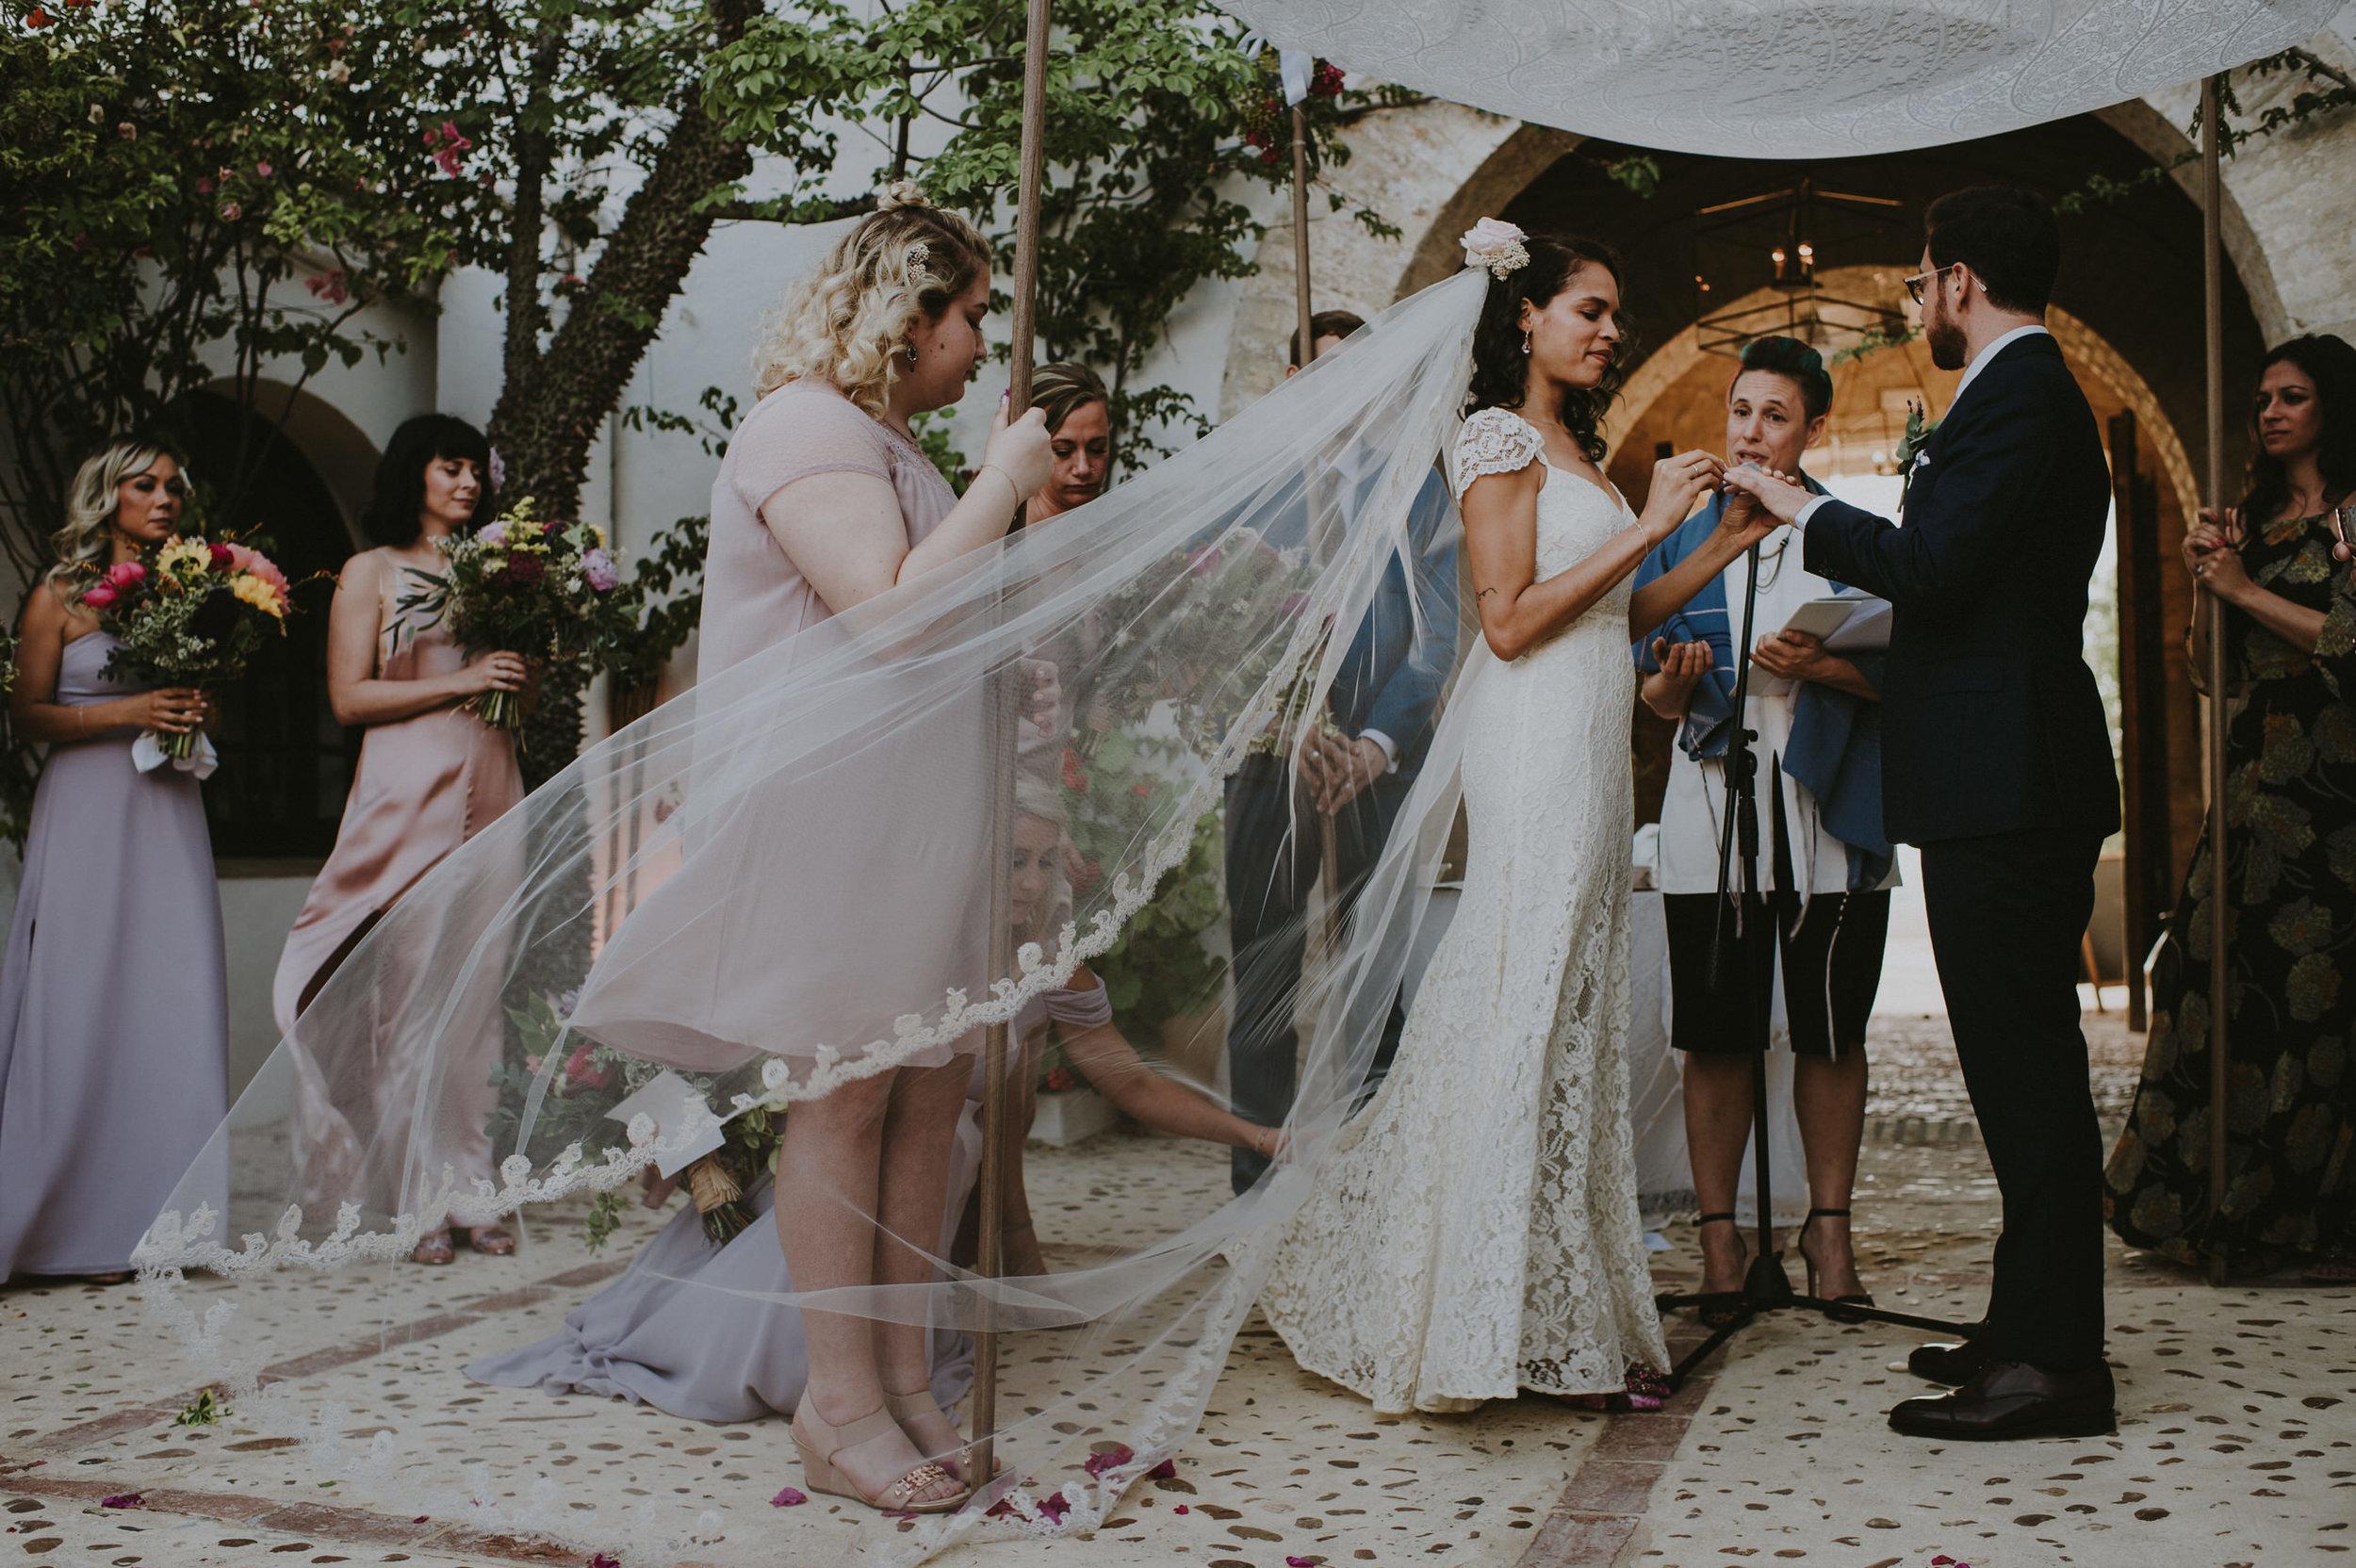 Andres+Amarillo+fotografo+boda+sevilla+natural+sin+poses+hacienda+san+rafael (64).JPG